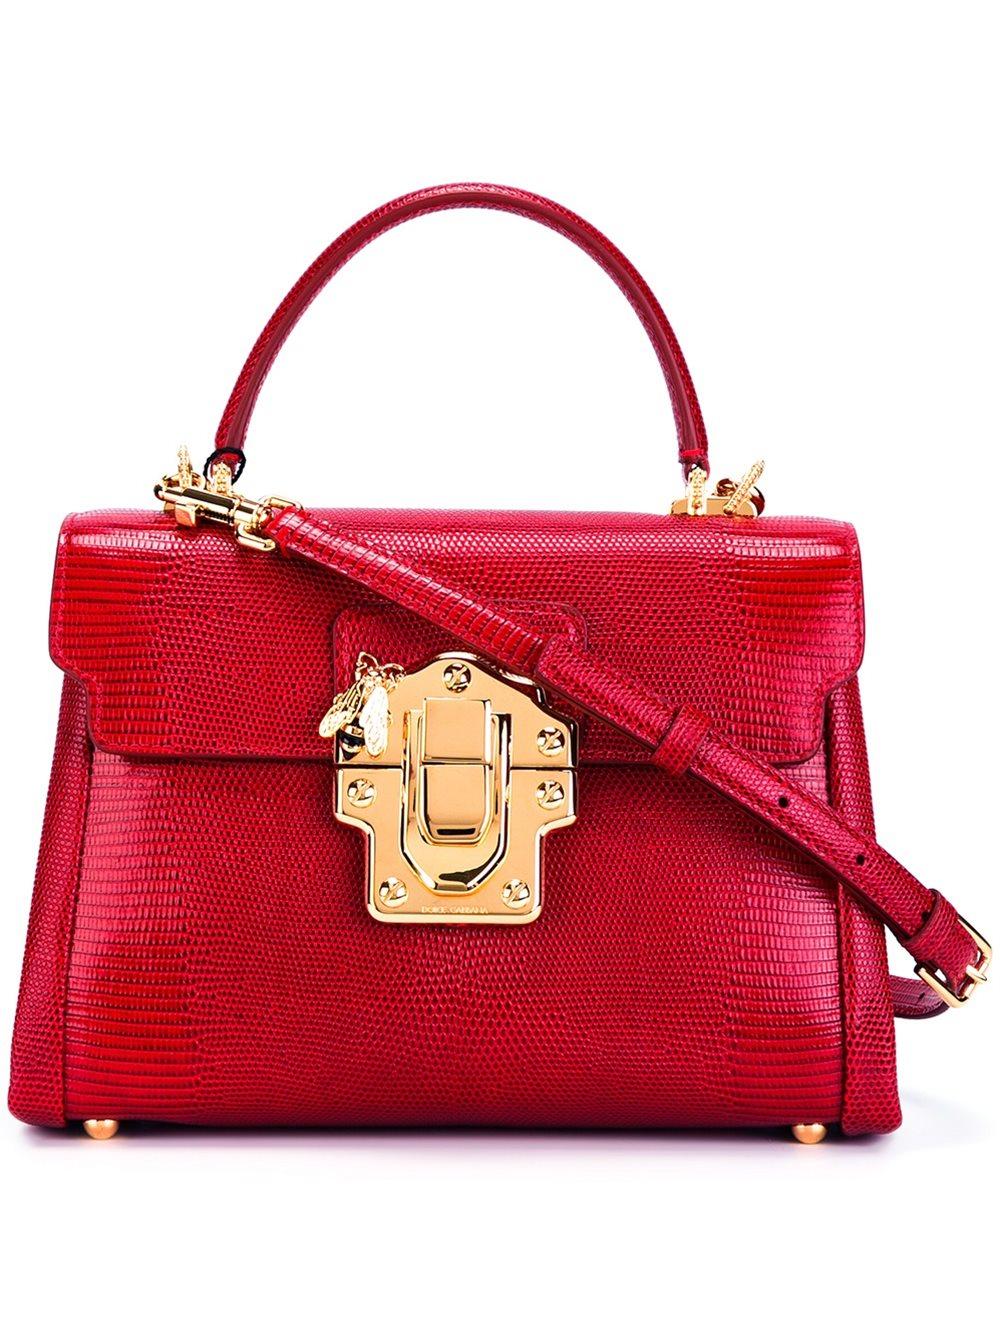 c6a45c03a2d7 Dolce Gabbana Handbags Australia